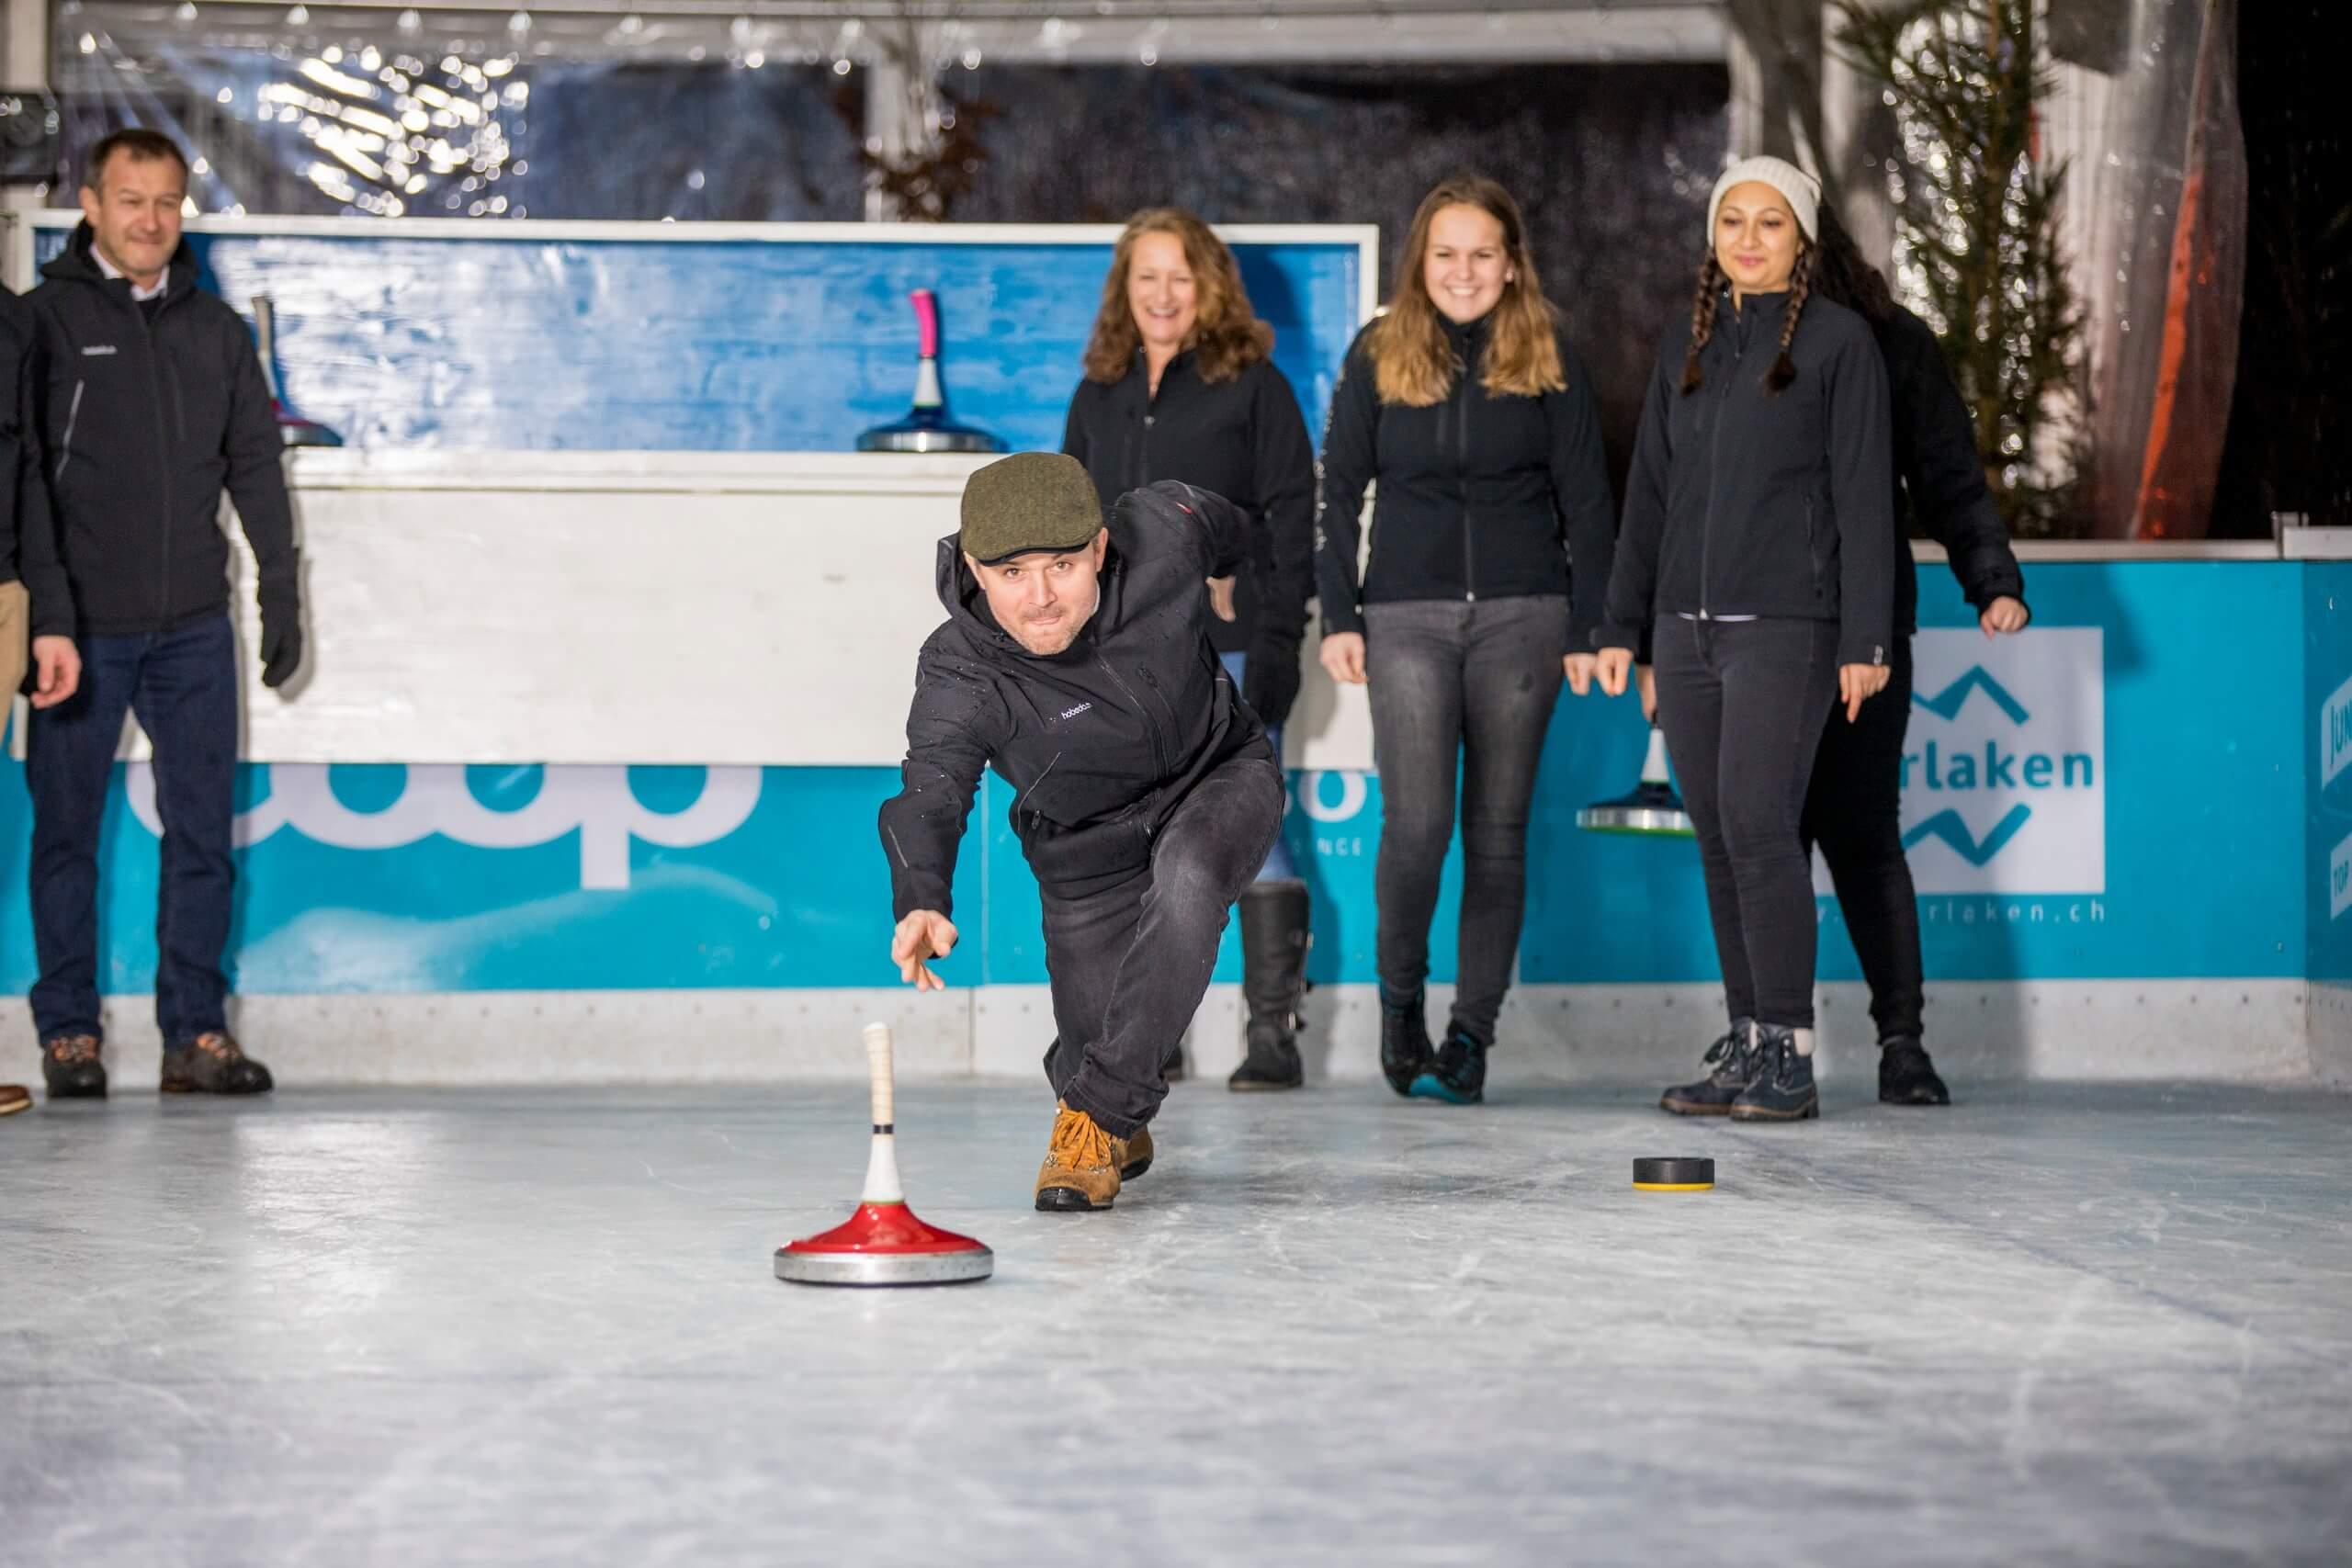 top-of-europe-ice-magic-interlaken-eisstockschiessen-winter-geschäftsausflug-kmu-vereine.jpg